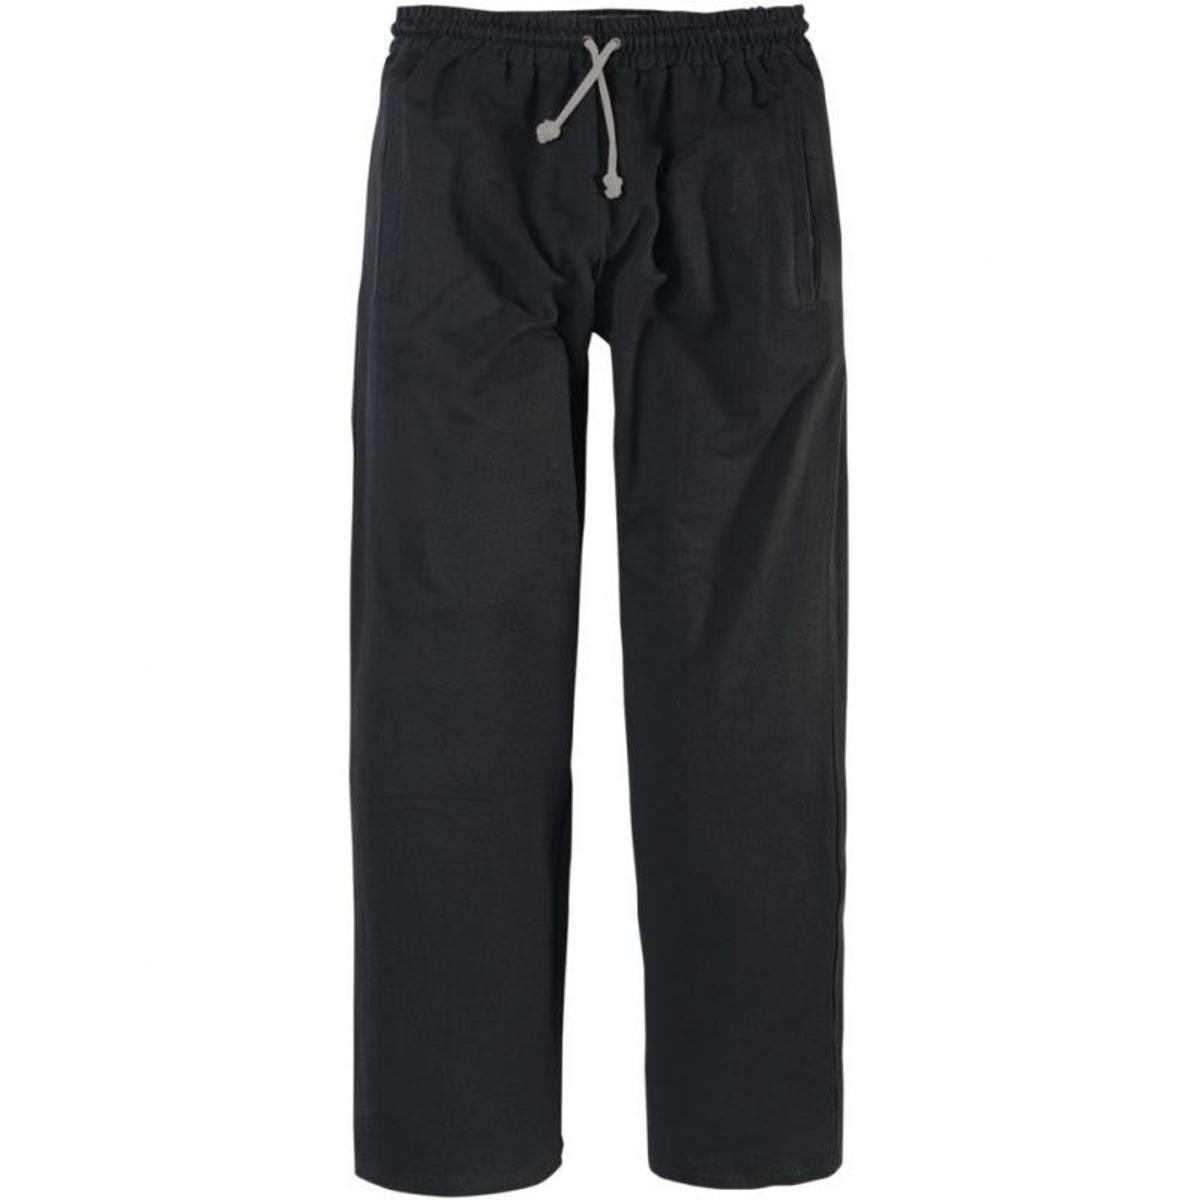 Pantalon de jogging north noir